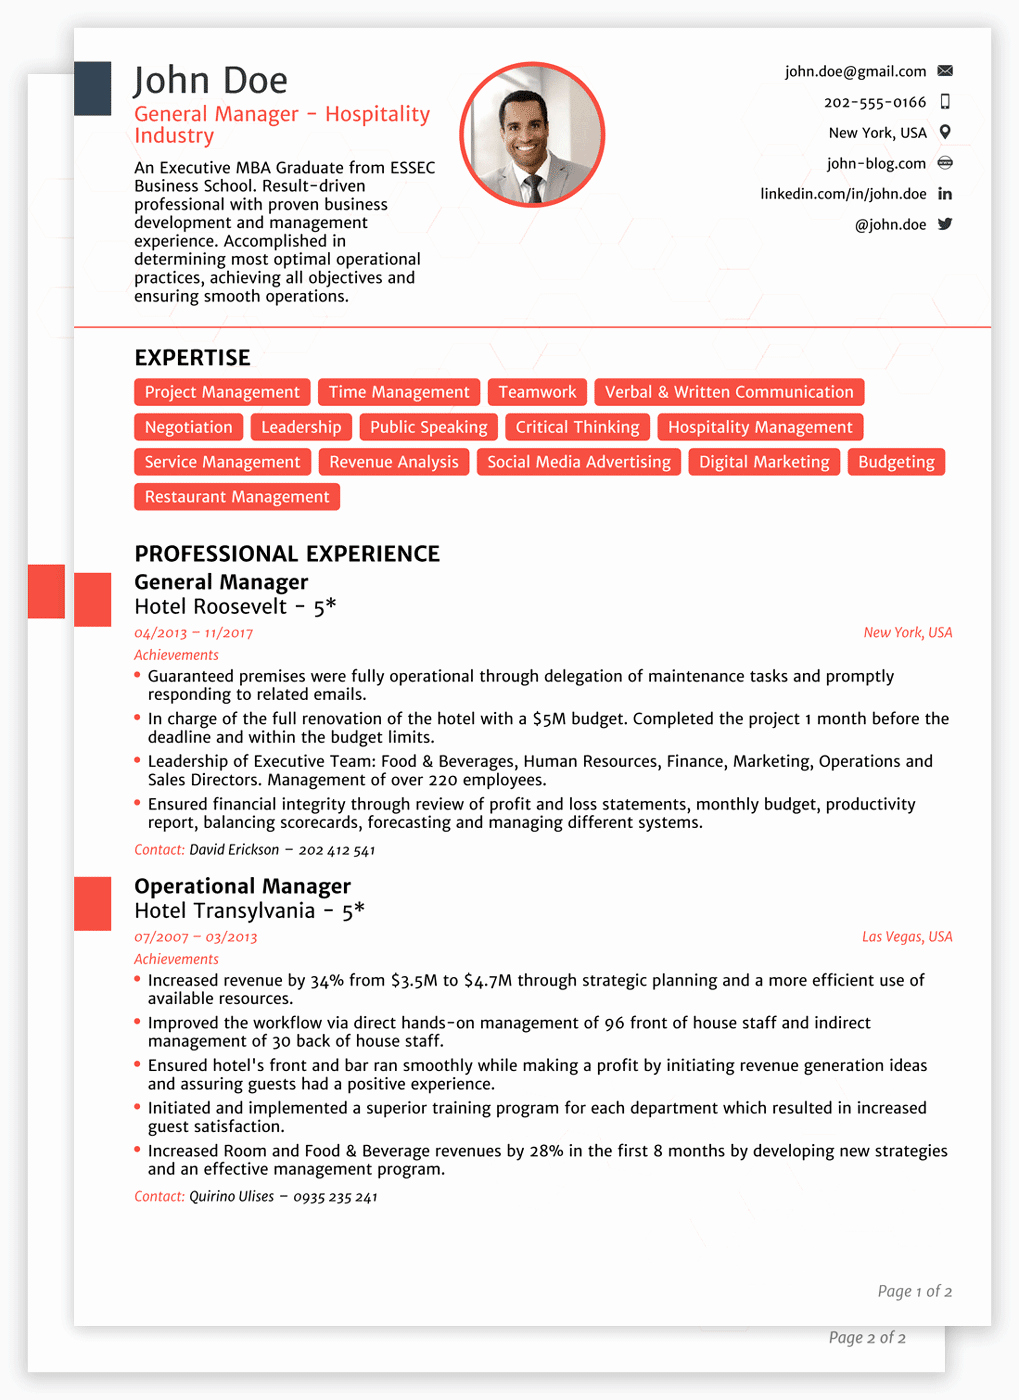 Sample Of Curriculum Vita Beautiful Professional Cv Templates for 2019 [edit & Download]